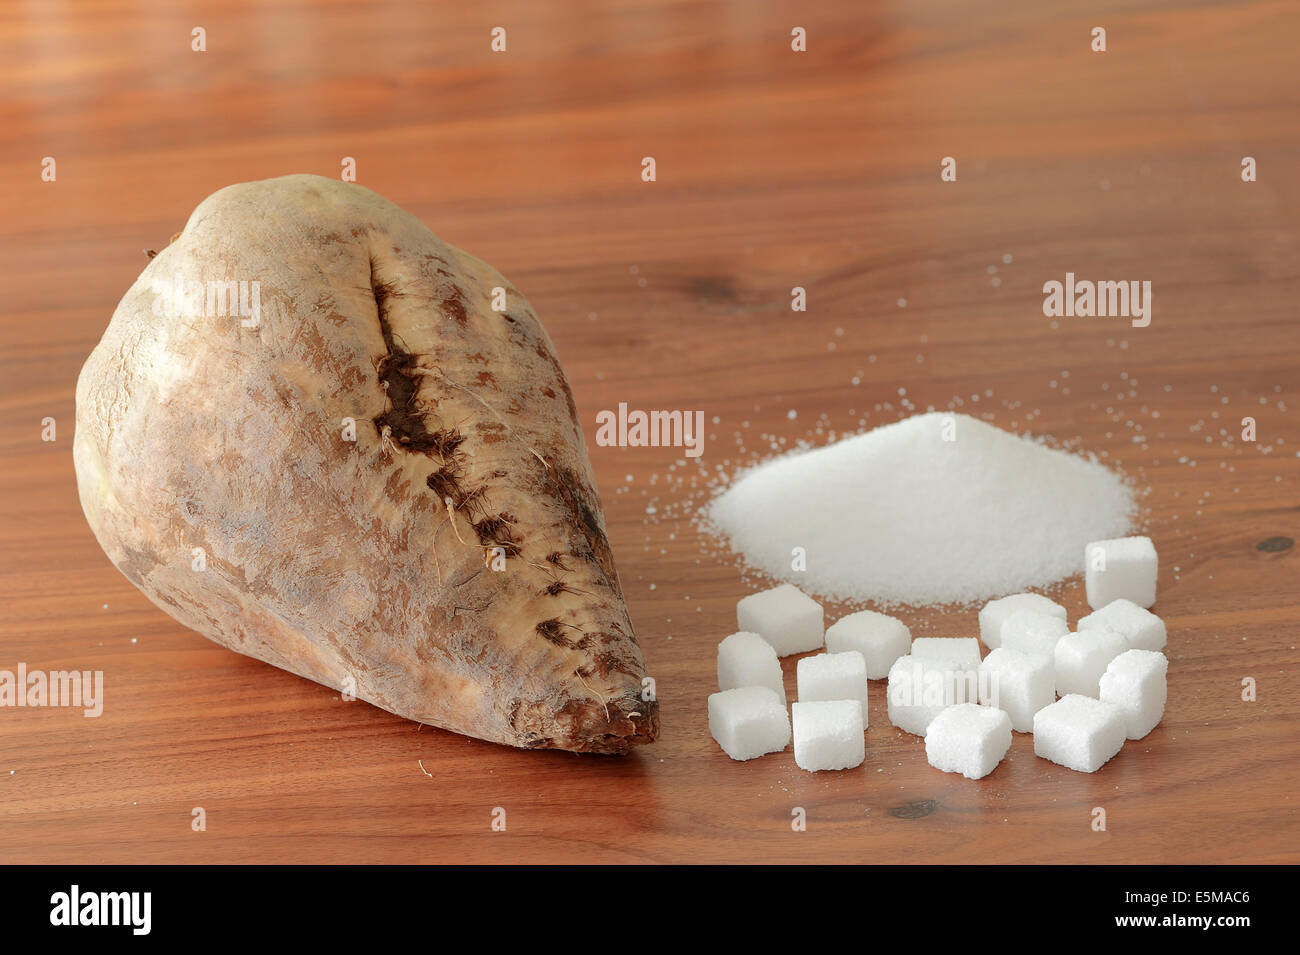 Sugar Beet and white sugar (Beta vulgaris ssp. vulgaris var. altissima) - Stock Image